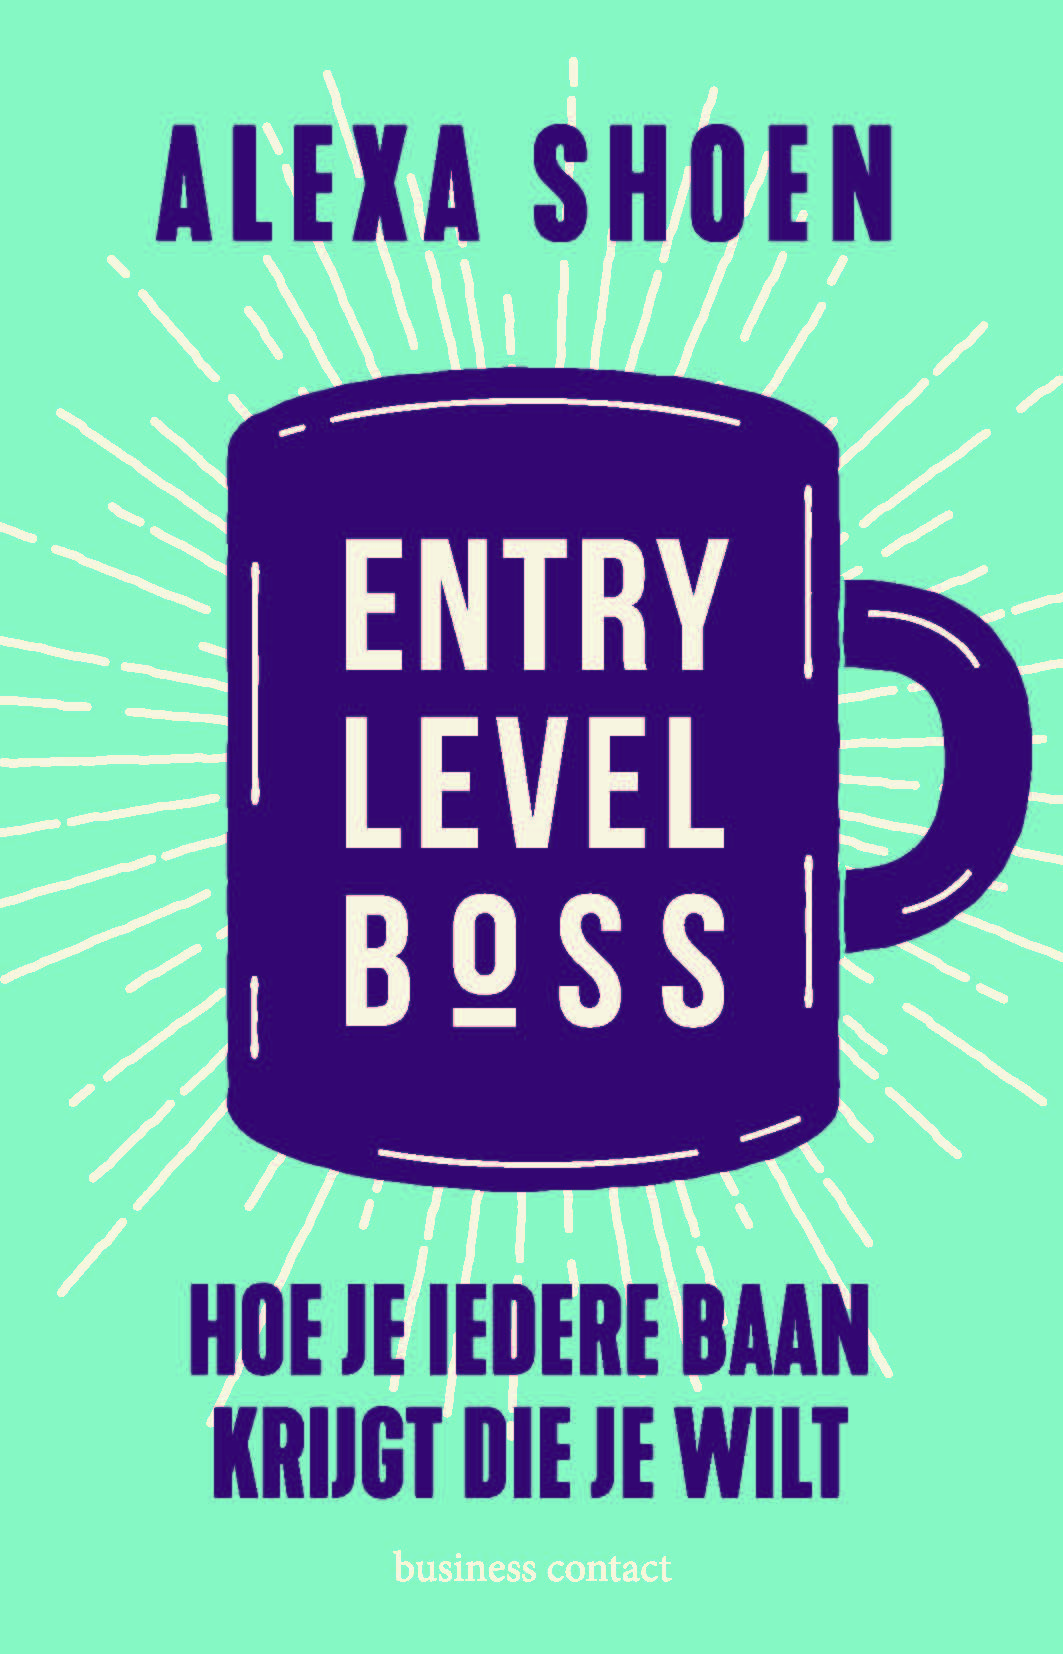 Entry Level Boss - Alexa Shoen